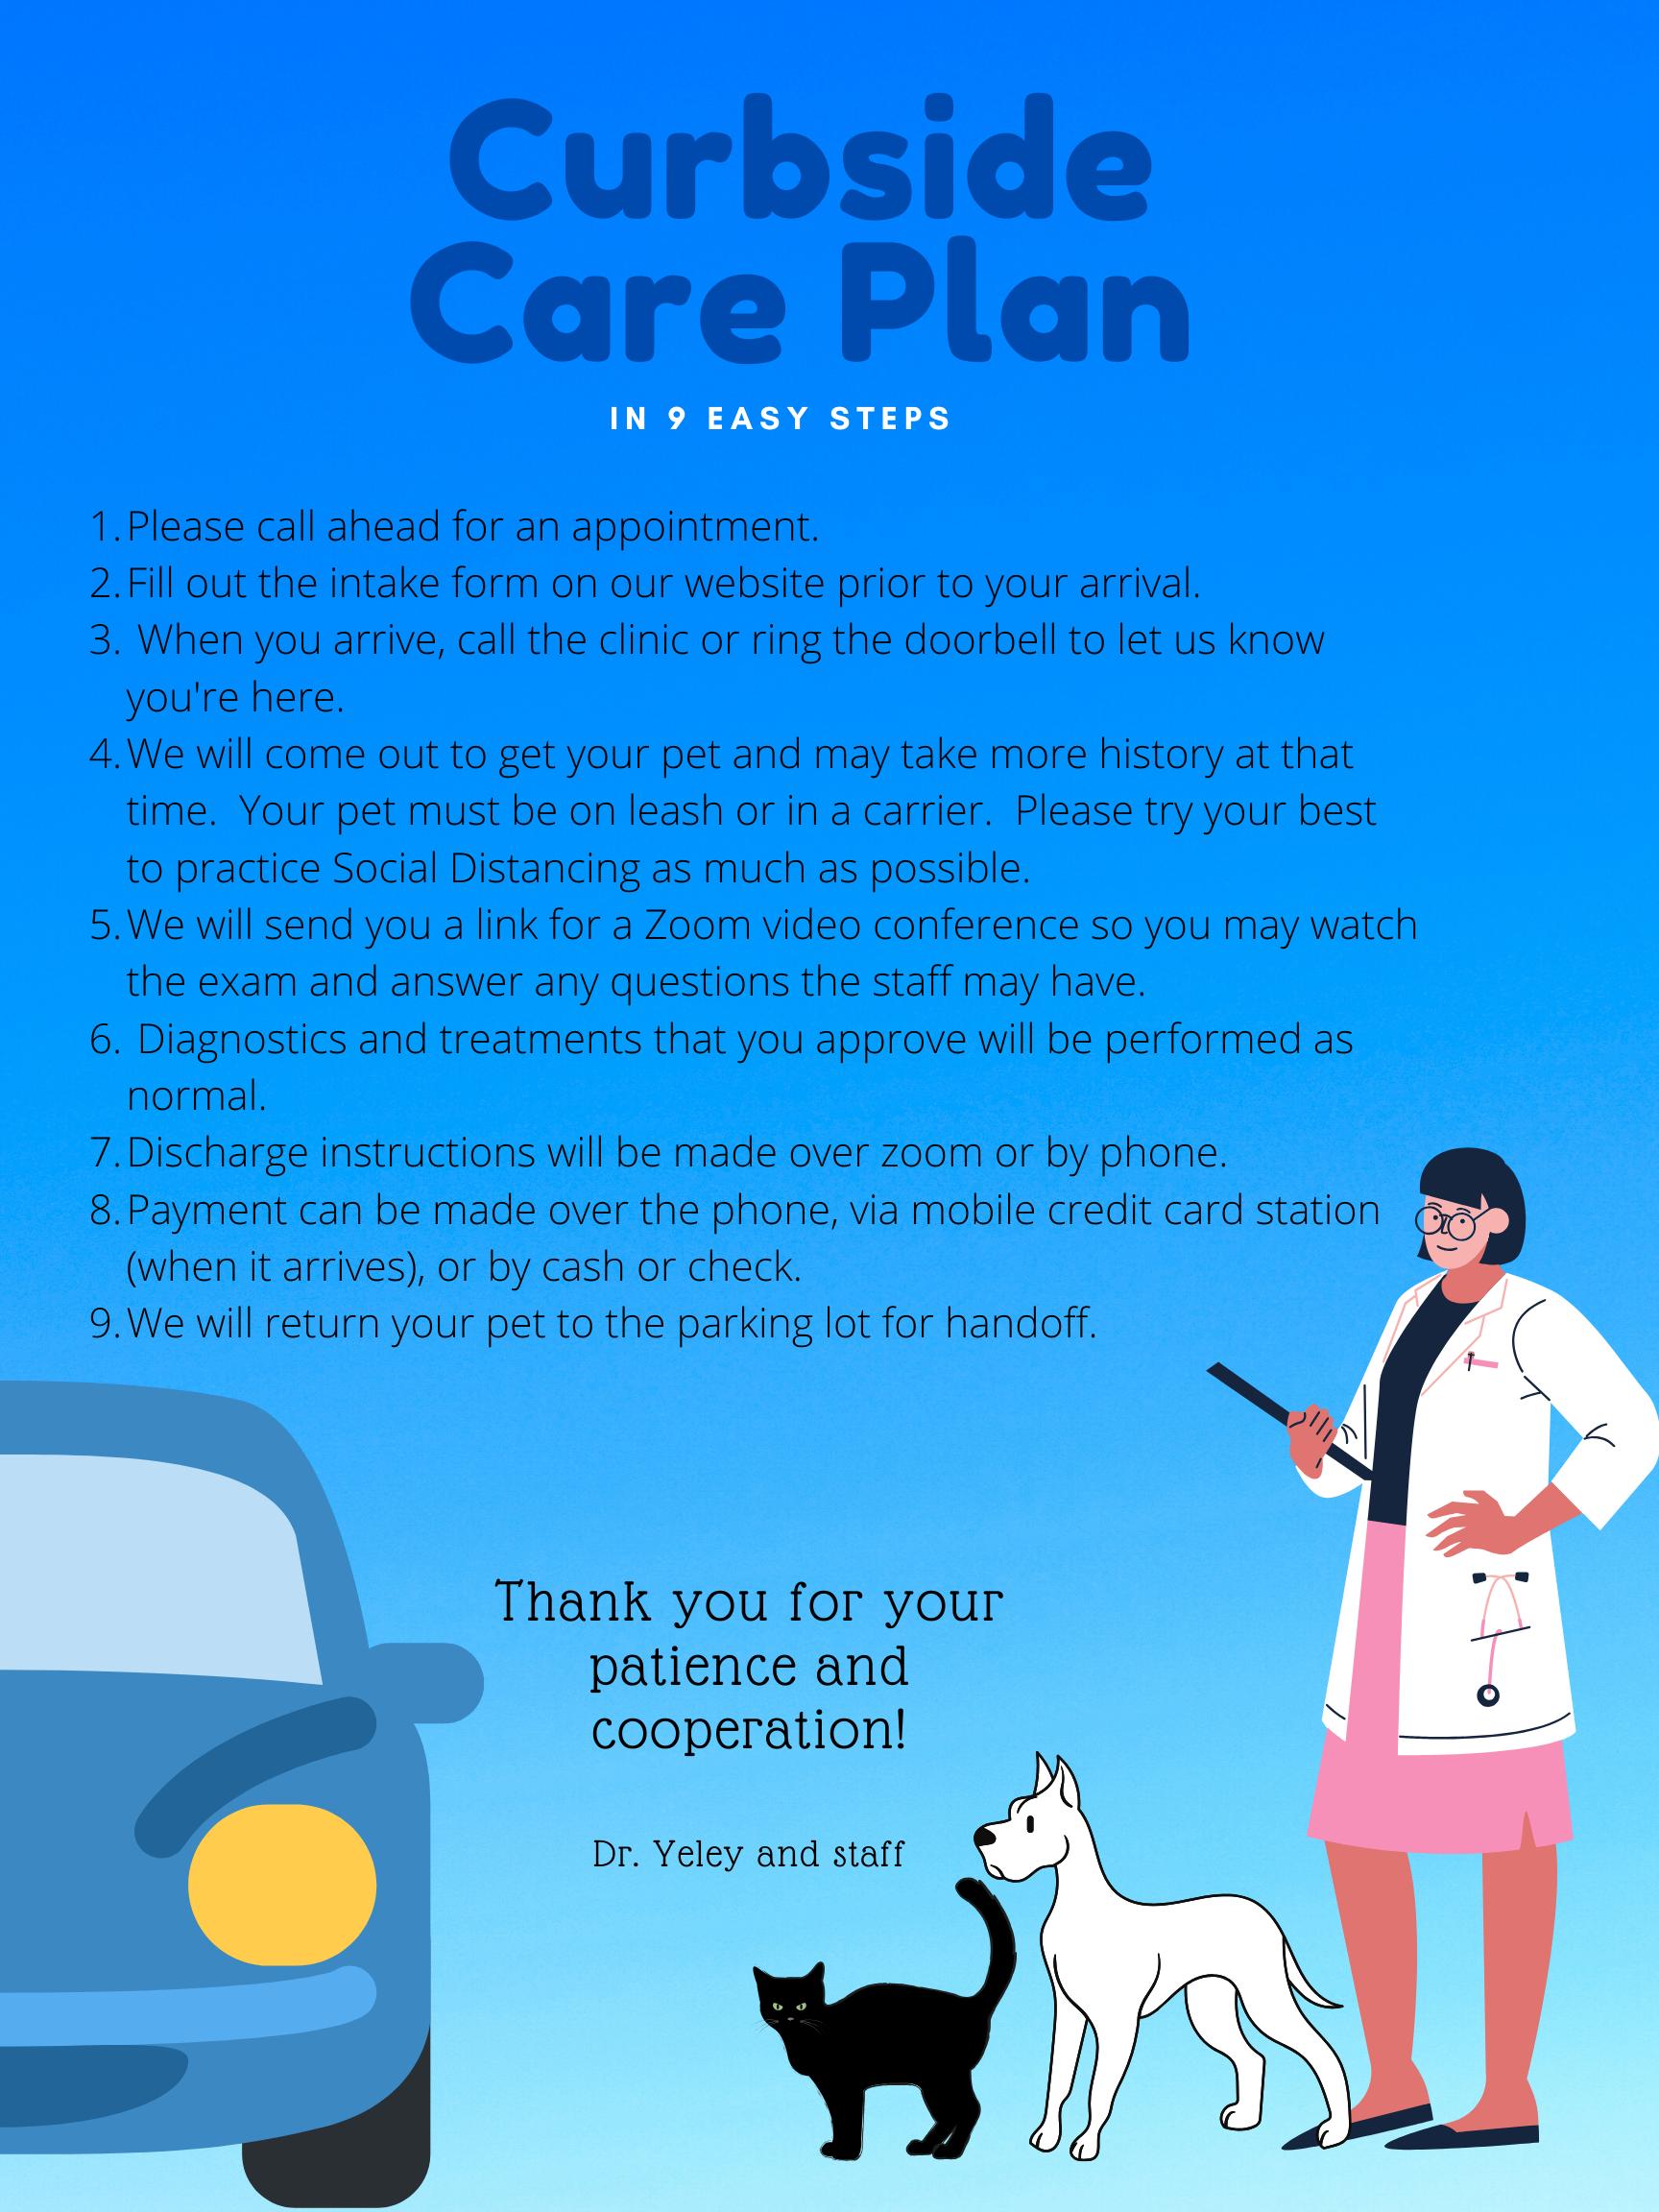 Carside Care Plan (2)